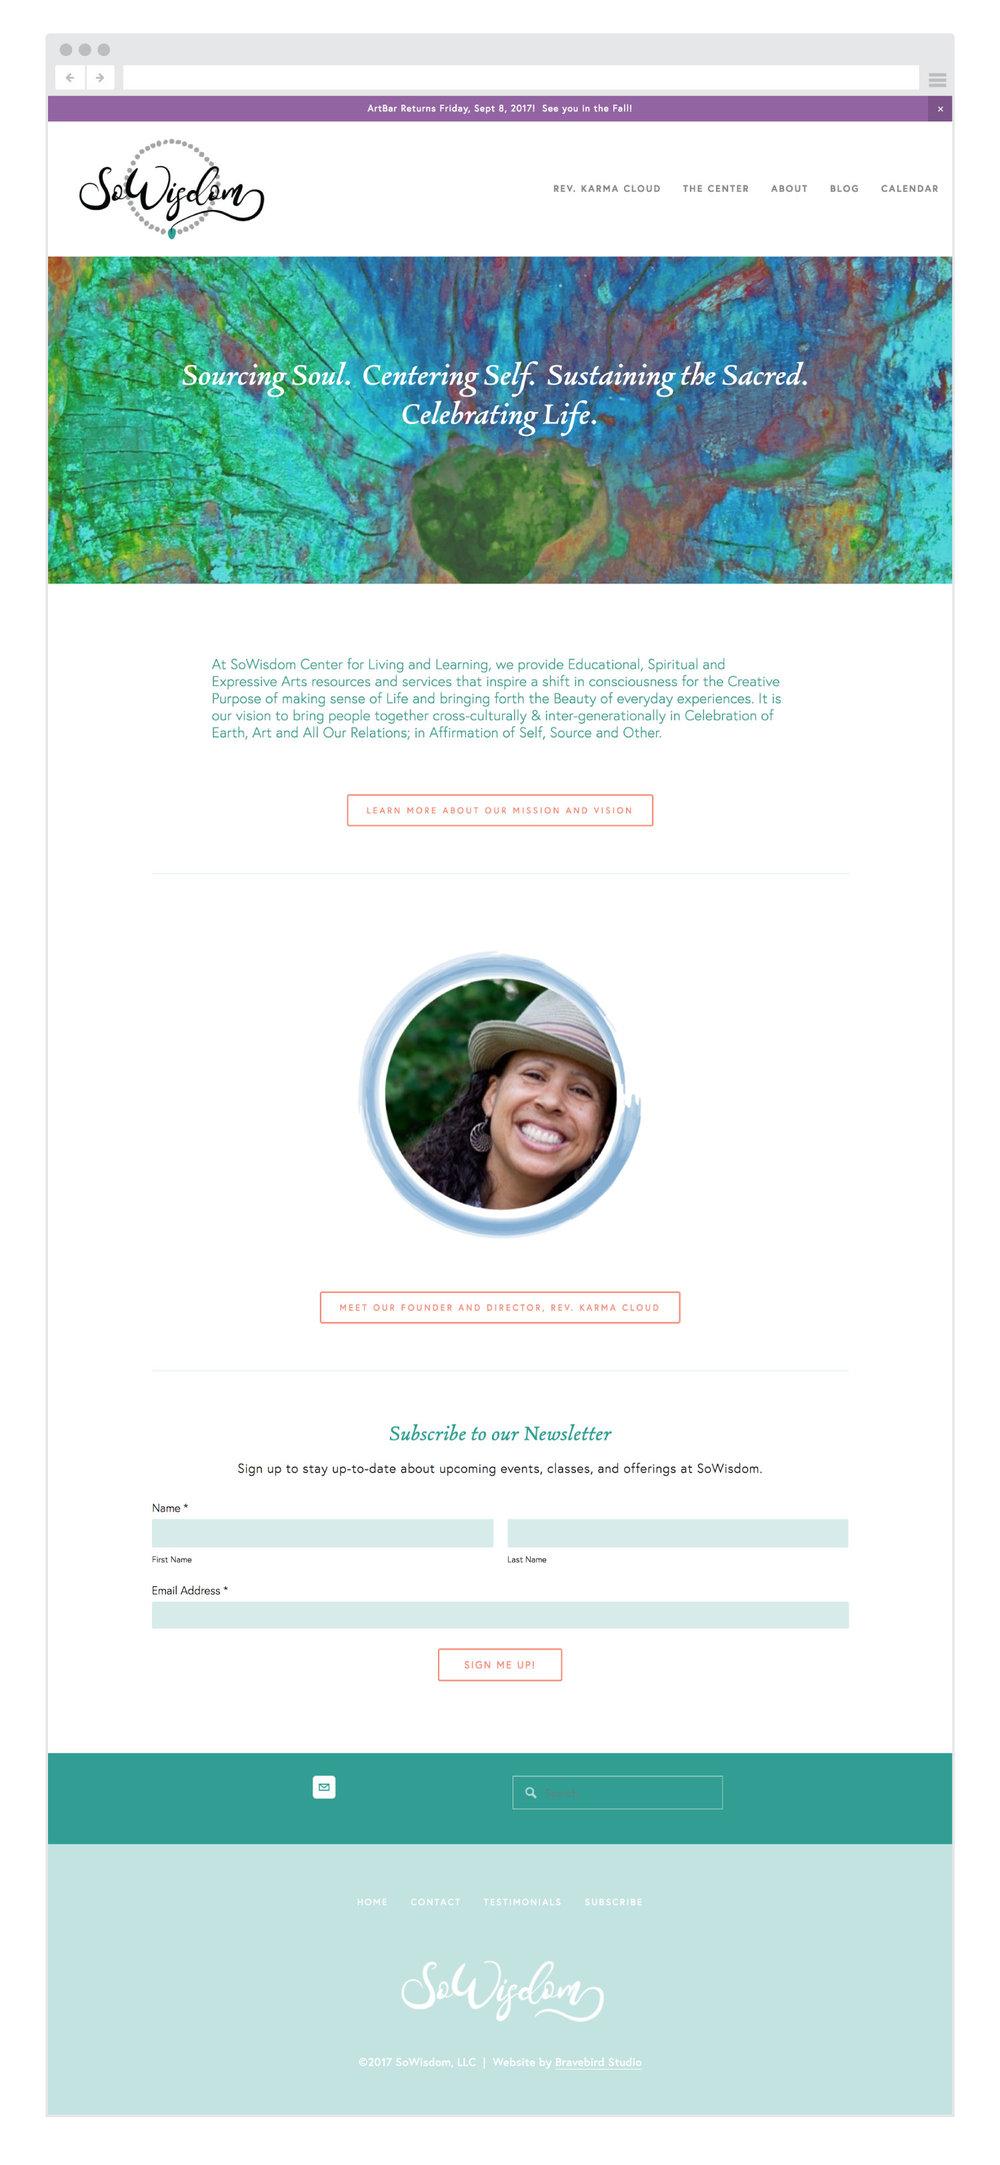 SoWisdom-homepage-Bravebird-Studio-web-design